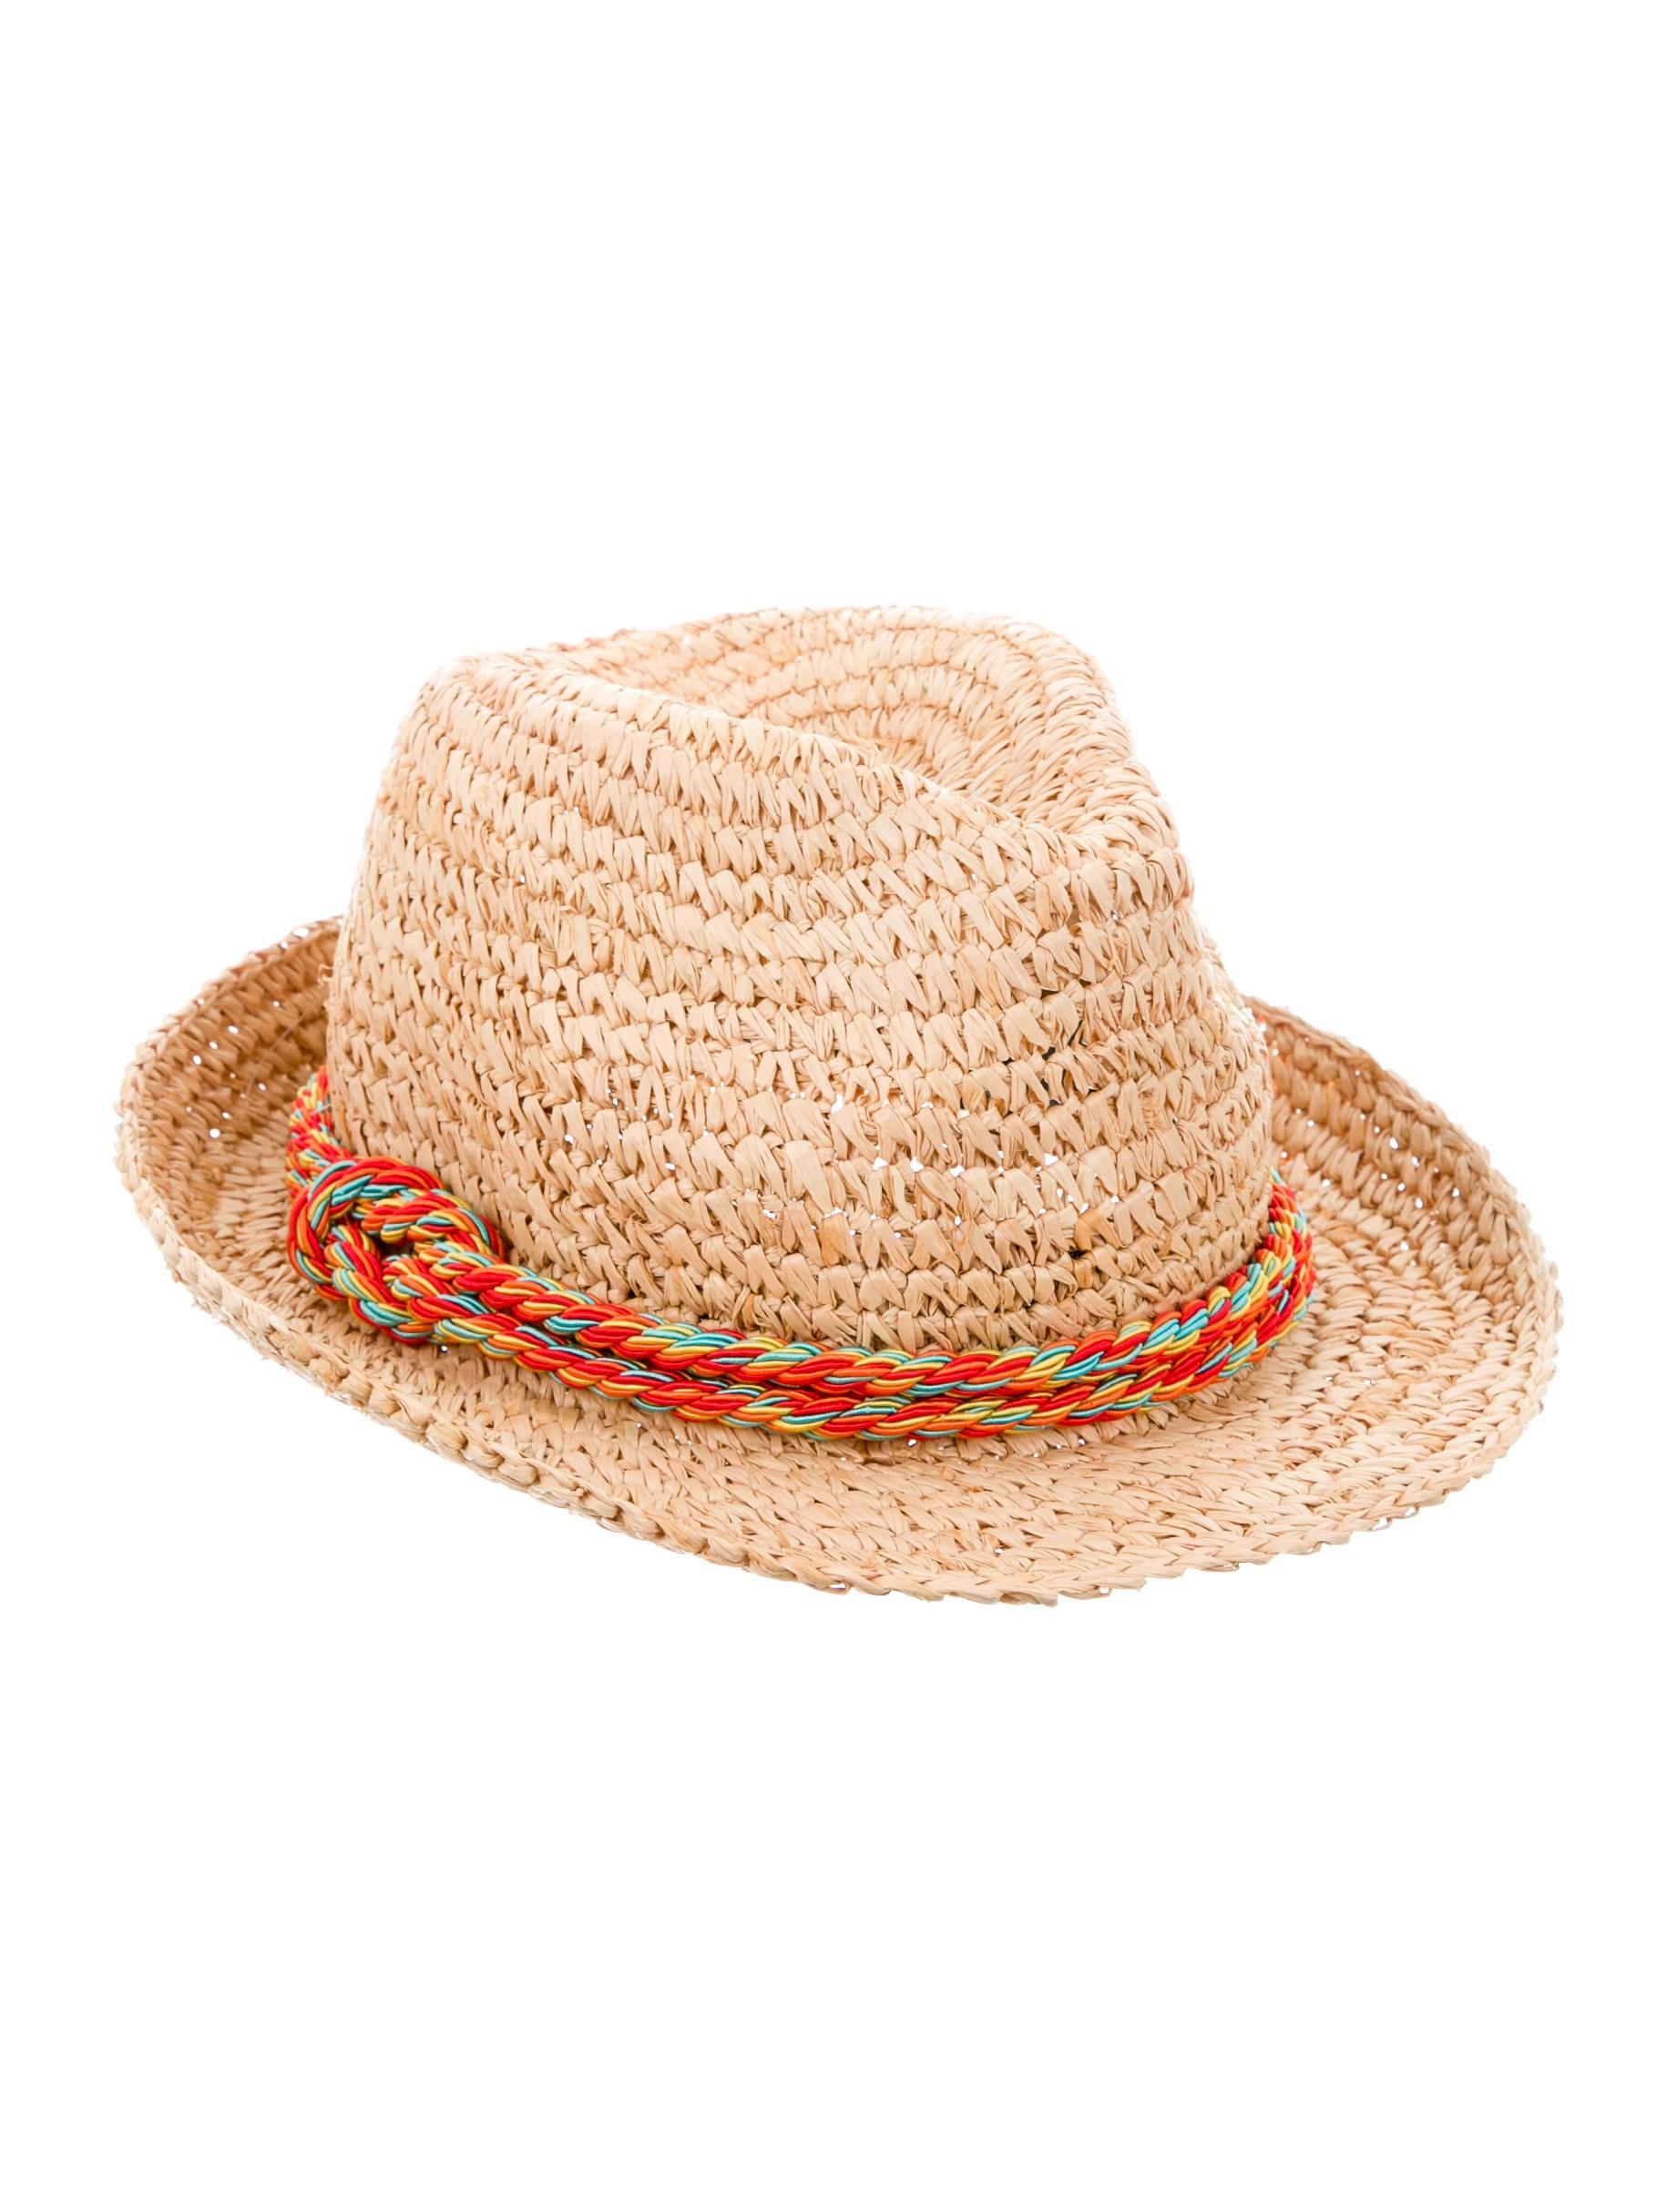 Tracy Watts Straw Fedora Hat - Accessories - WXH20015  3f90f47af7f